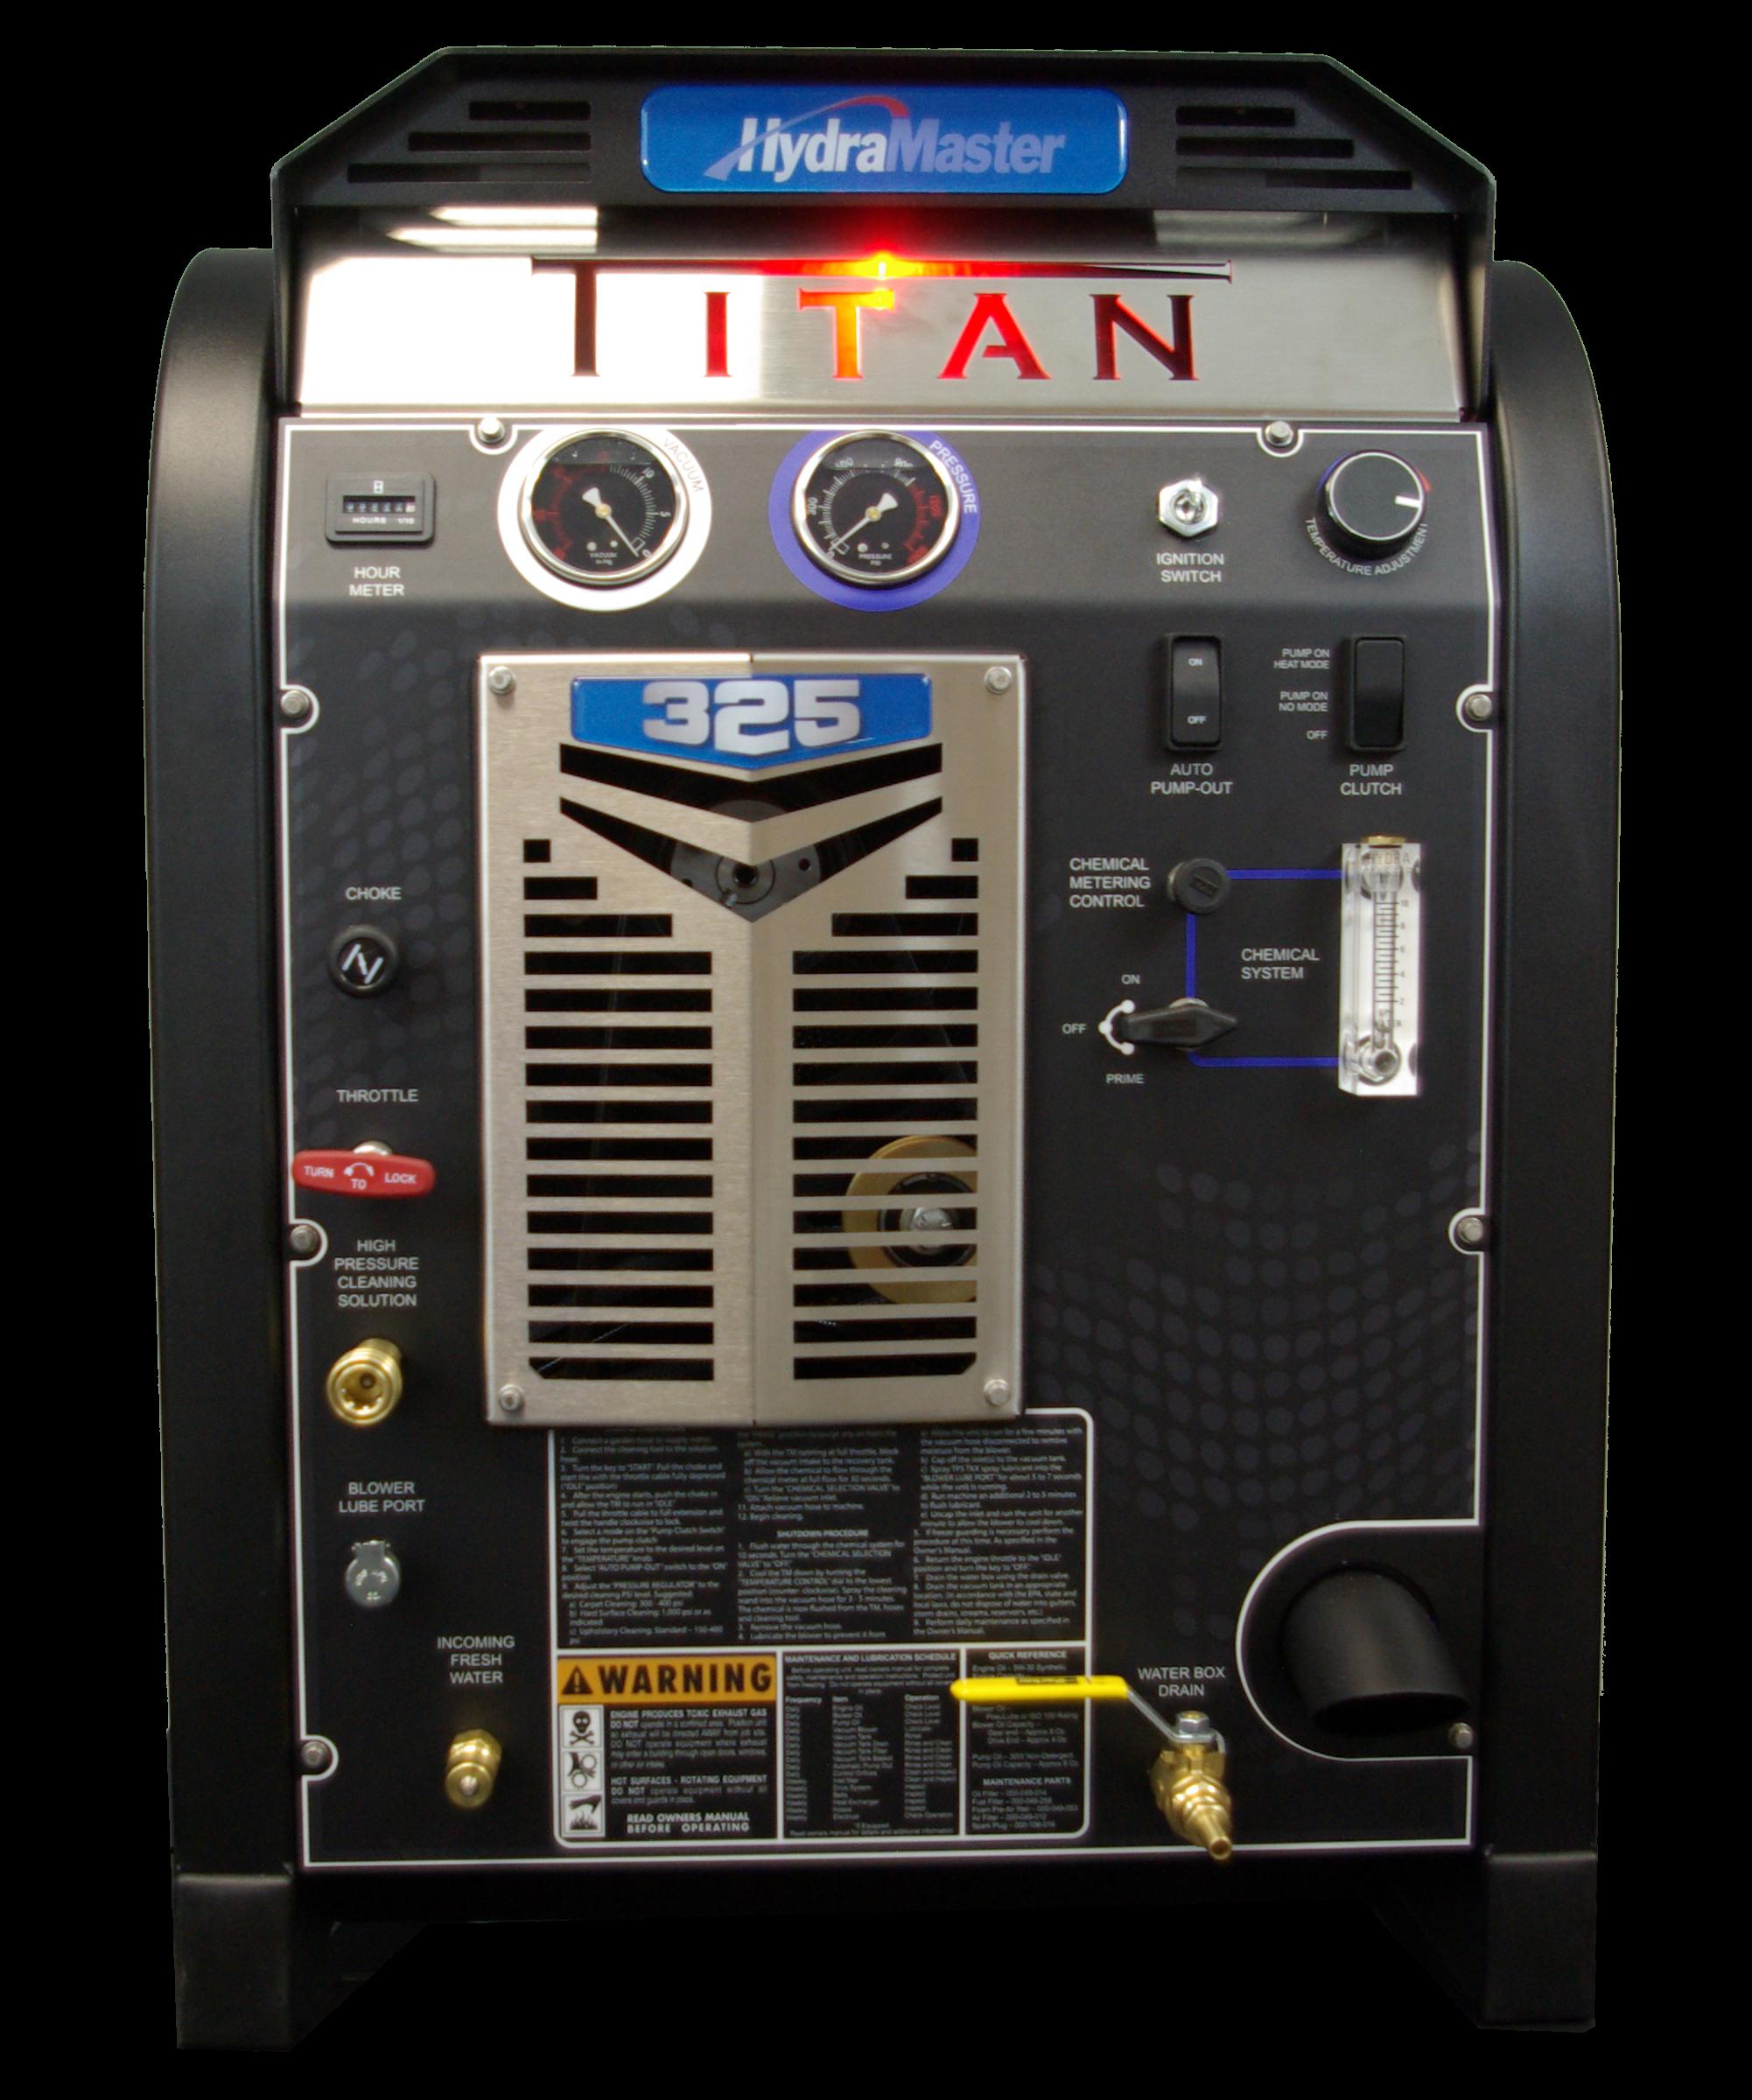 Hydramaster Titan 325